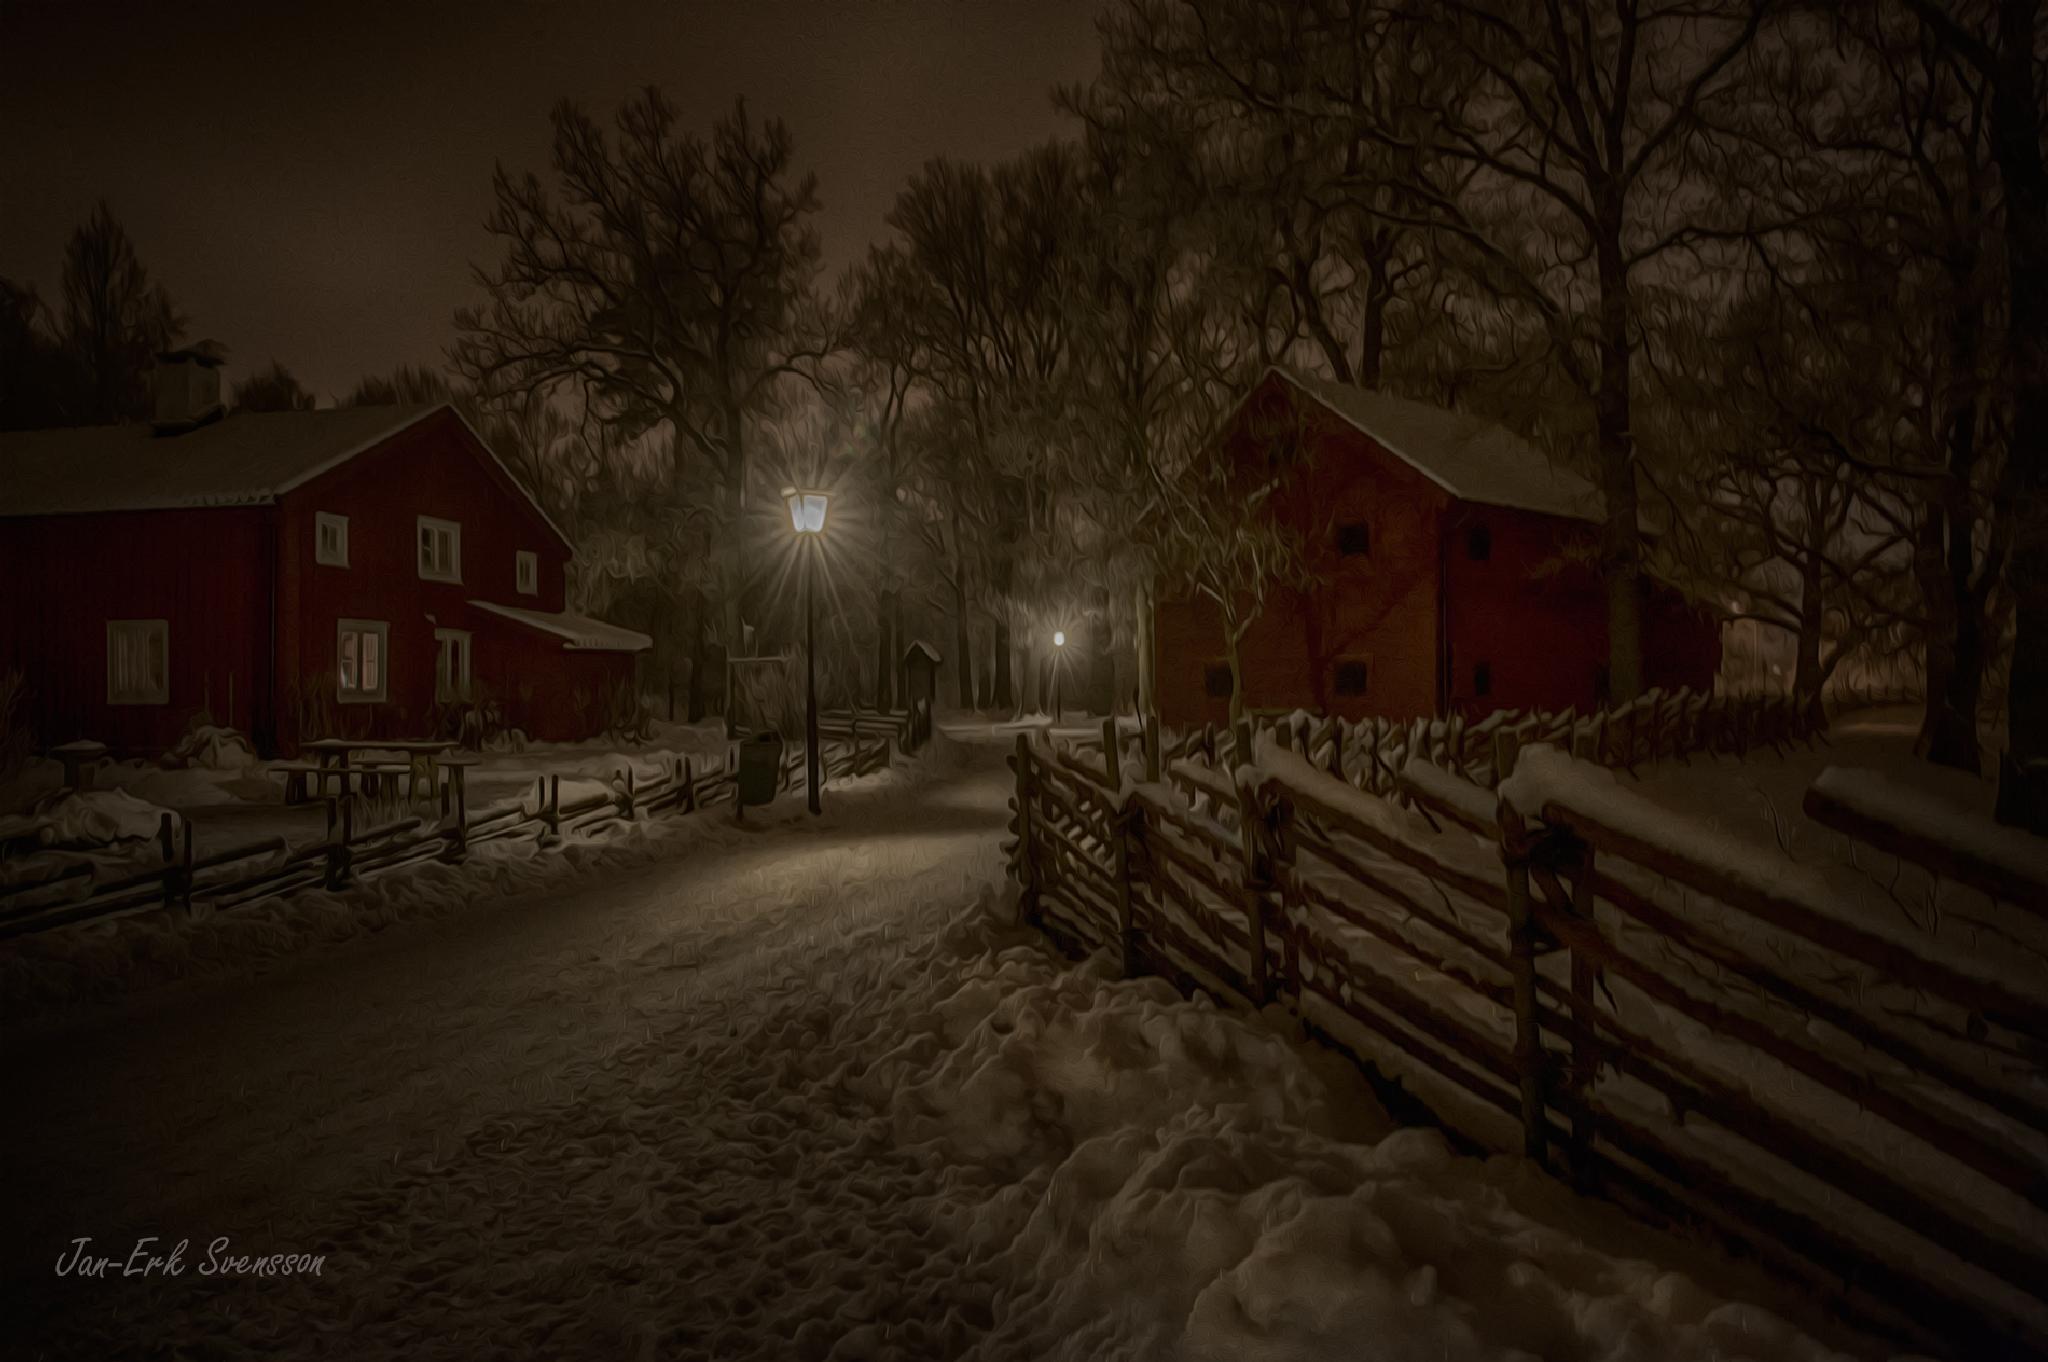 Untitled by Jan-Erik Svensson